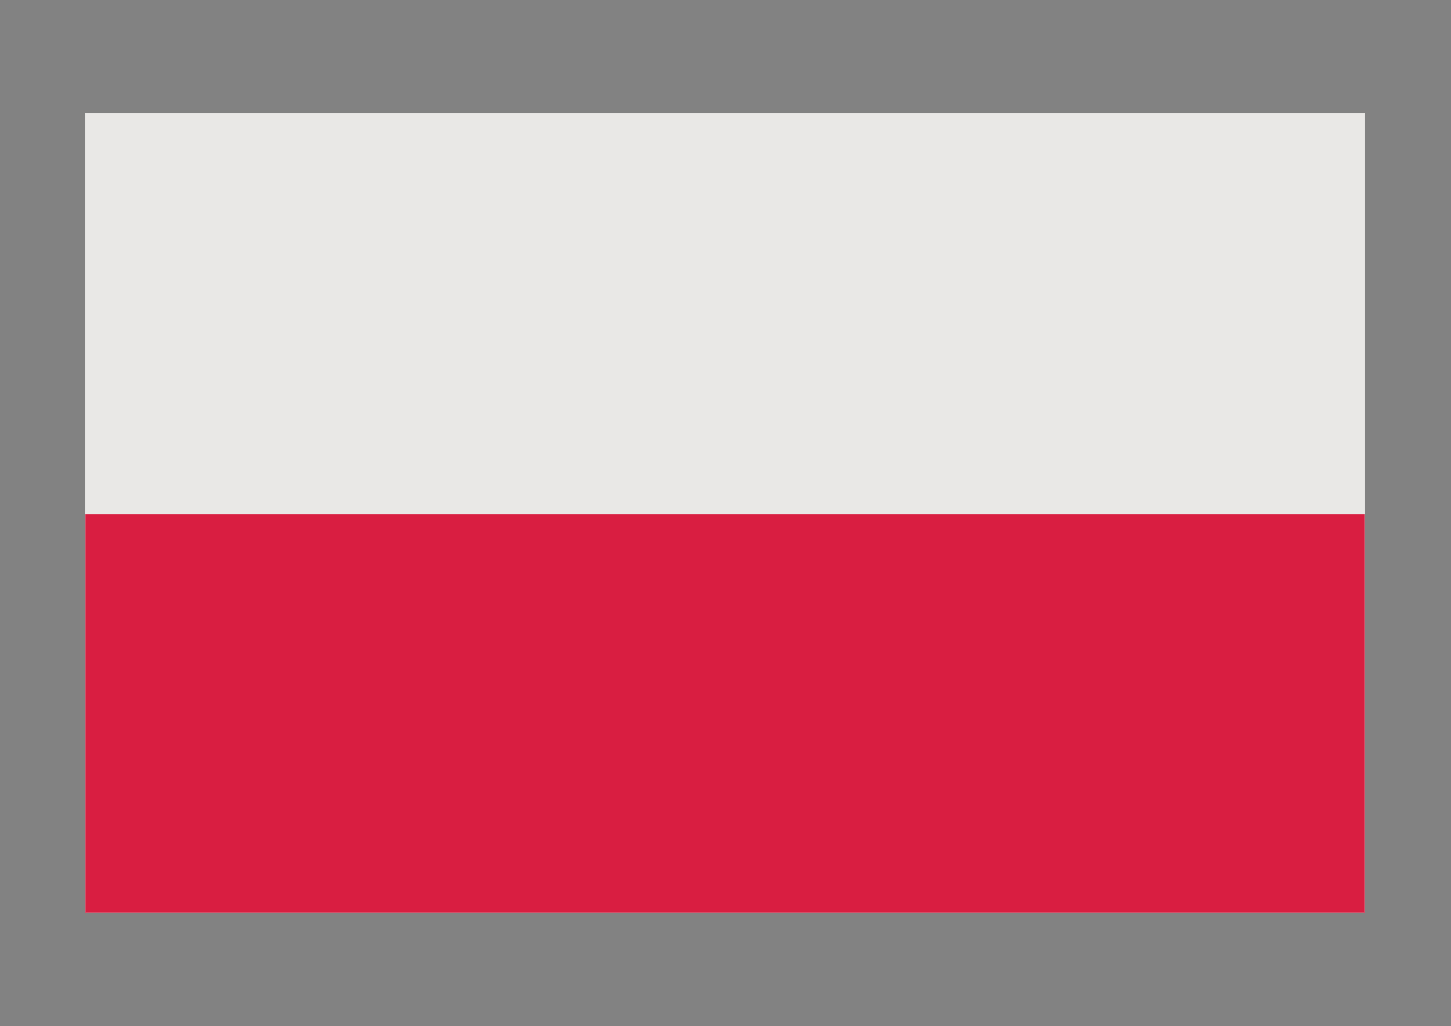 High Resolution Wallpaper | Flag Of Poland 1451x1026 px